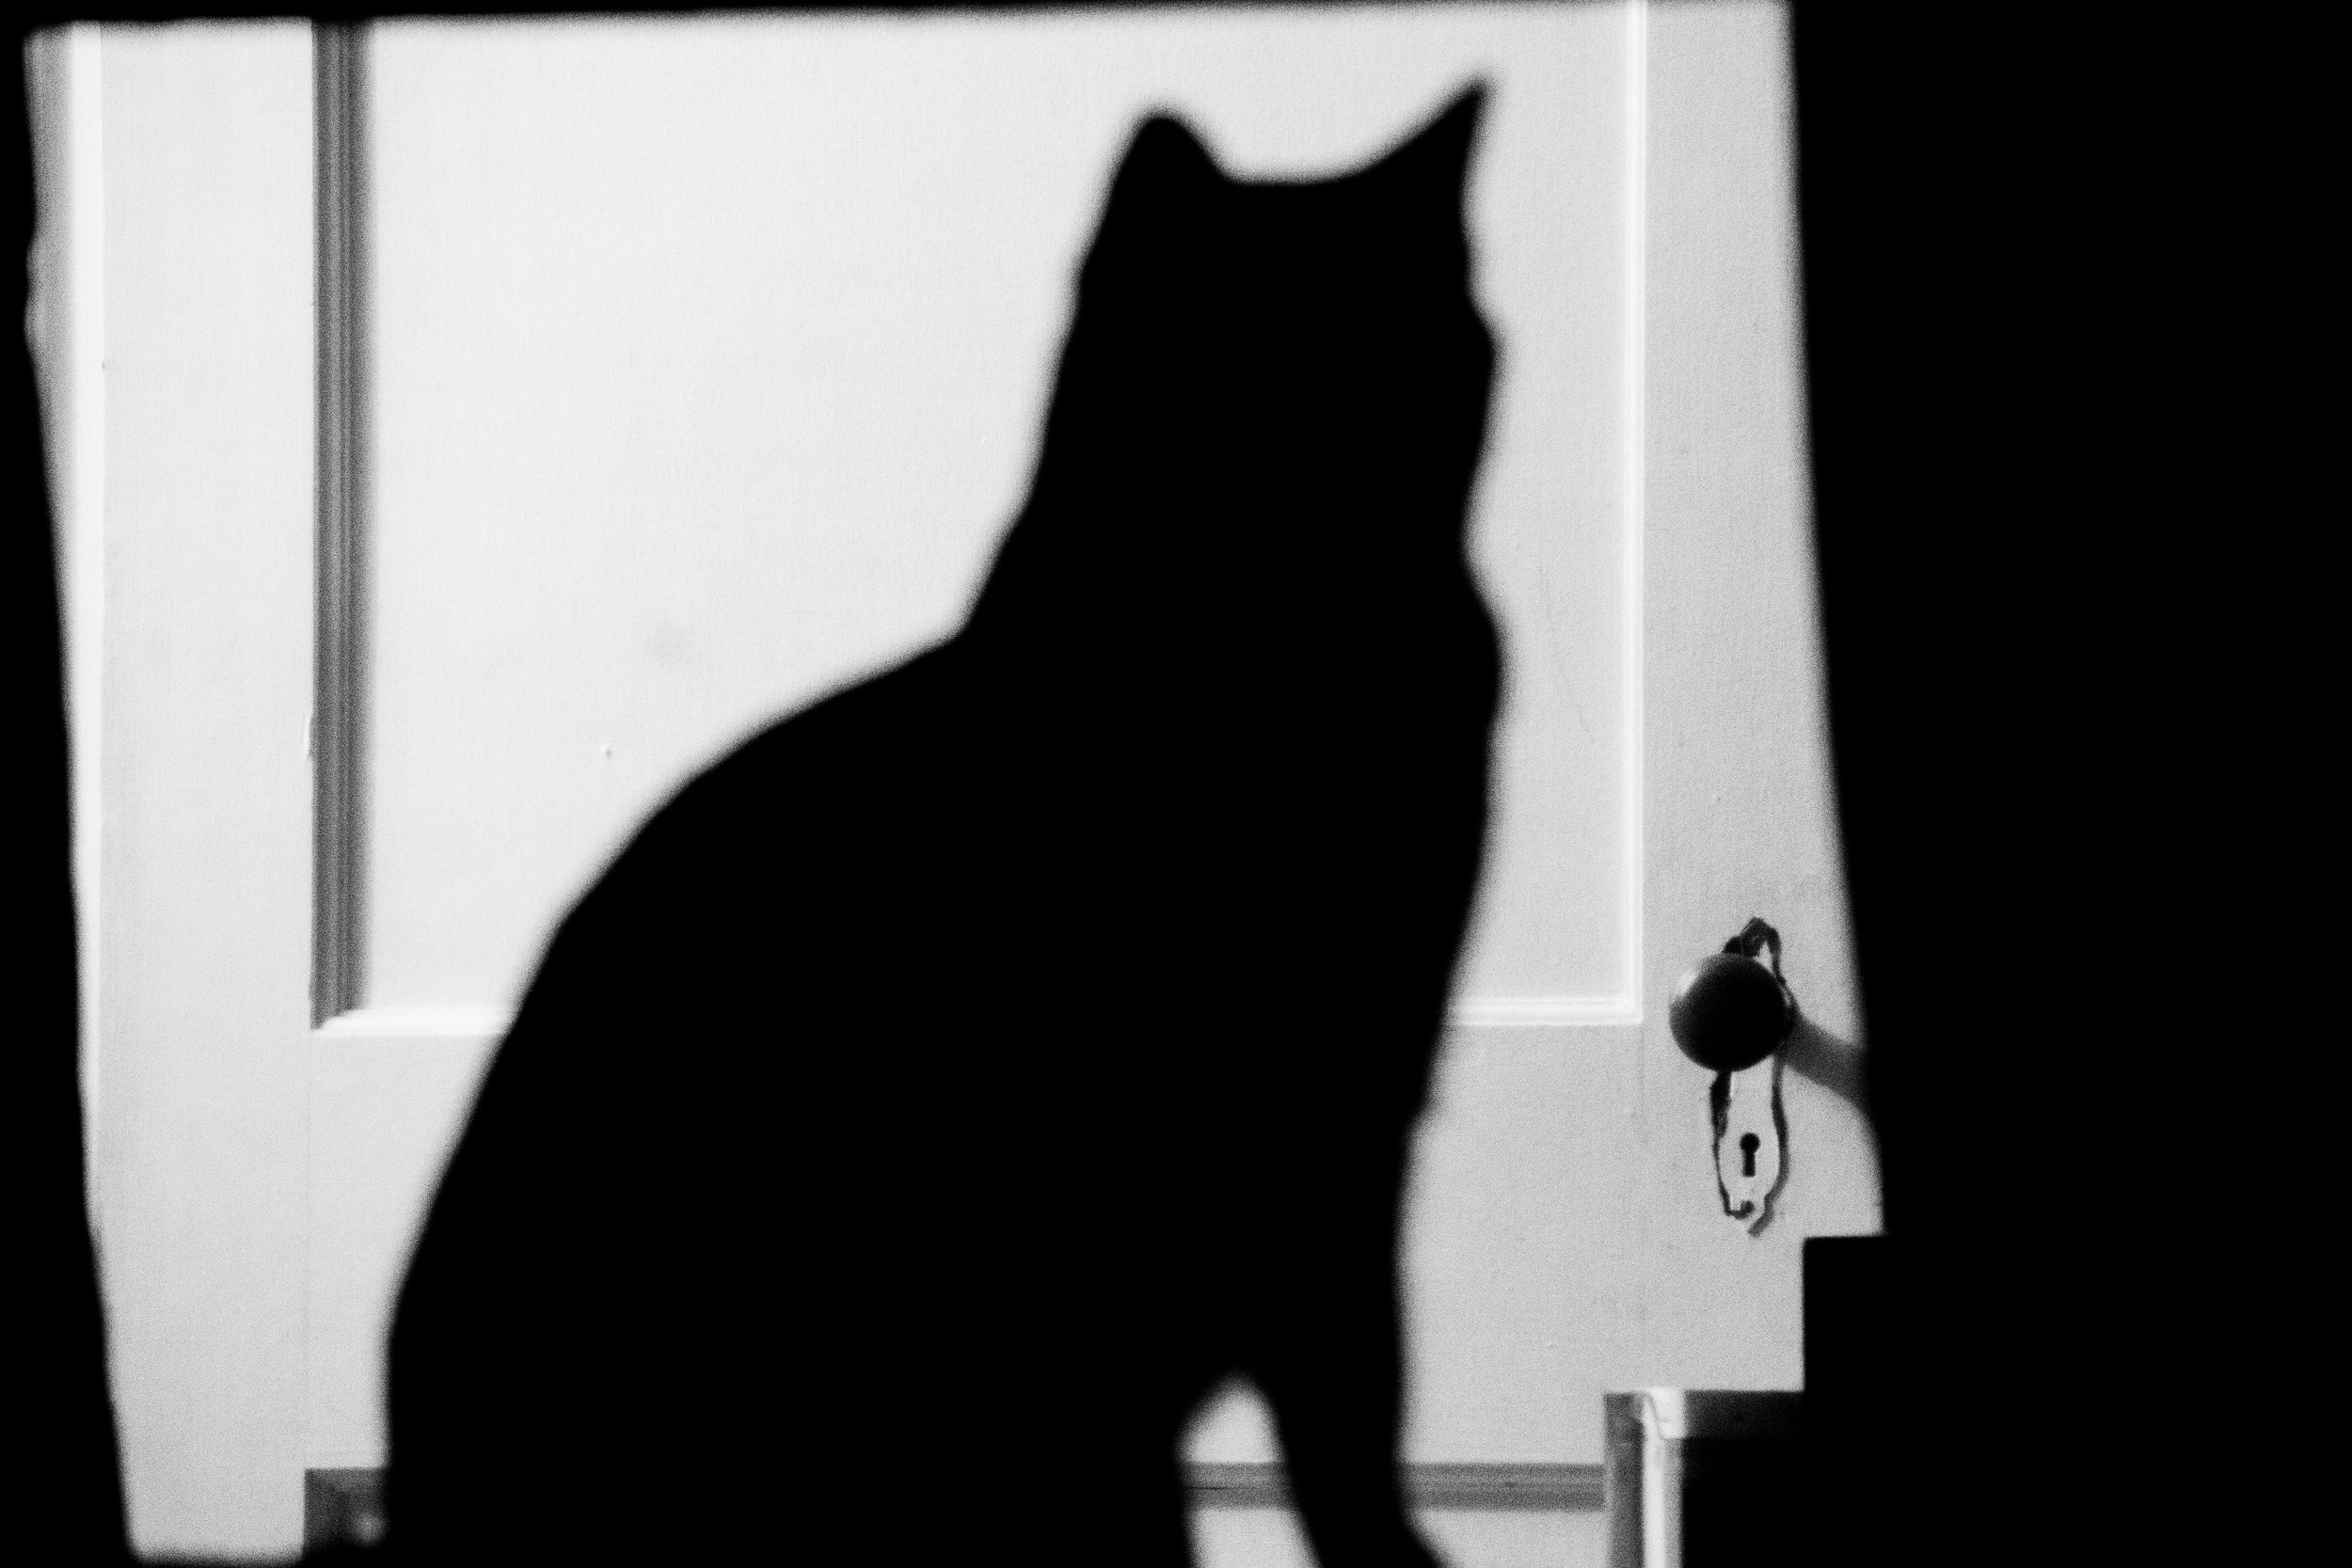 Pablito Silhouette-4.jpg